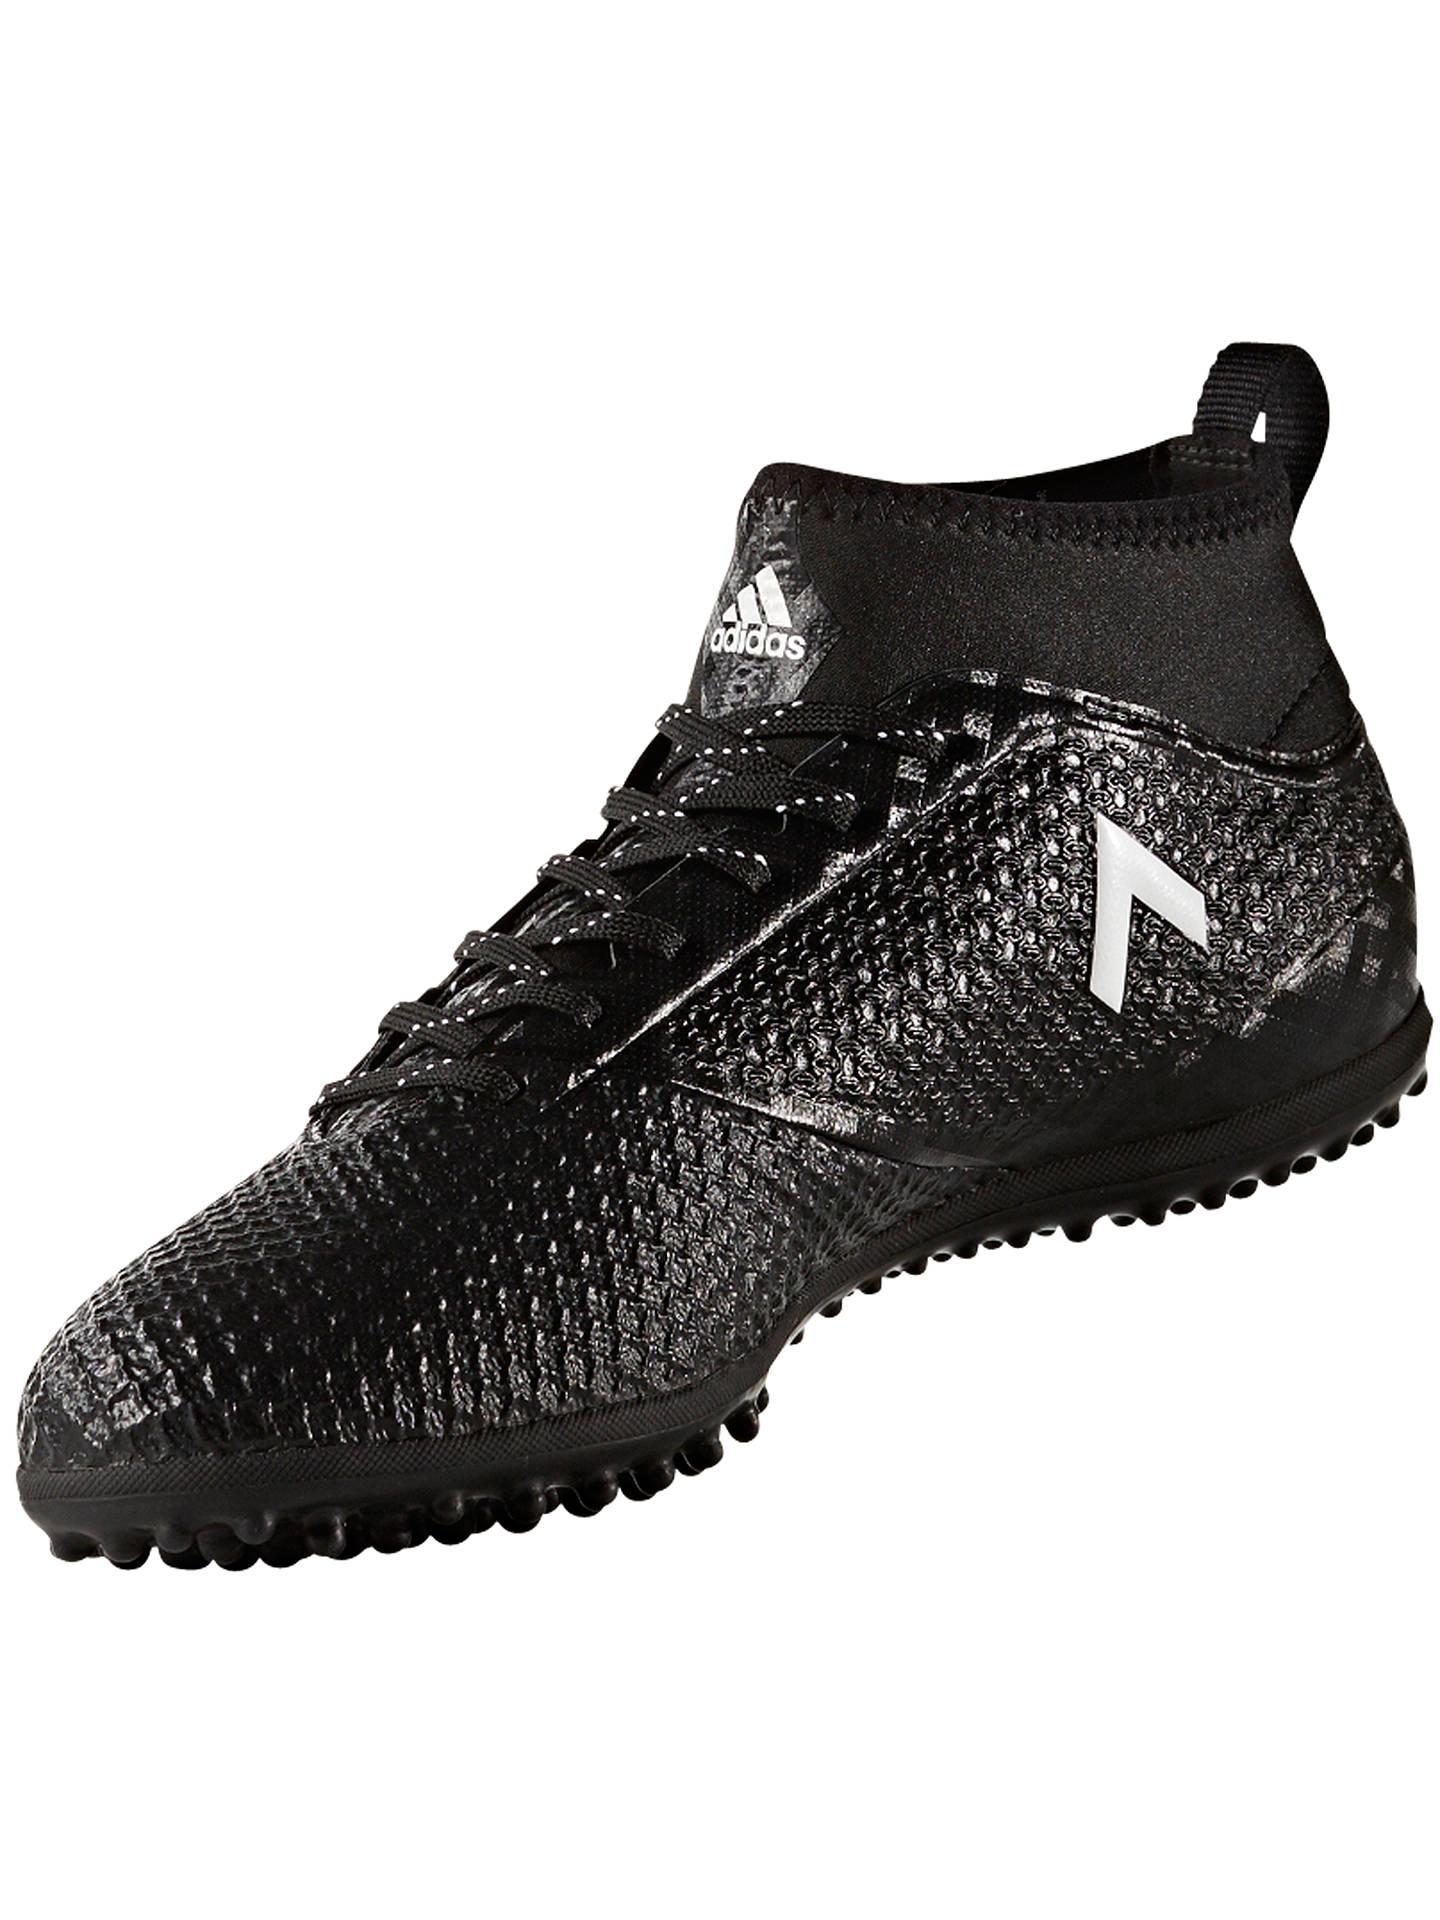 sports shoes e7b8d beb6f Adidas Ace 17.3 Primemesh AG Men's Football Boots, Black at ...